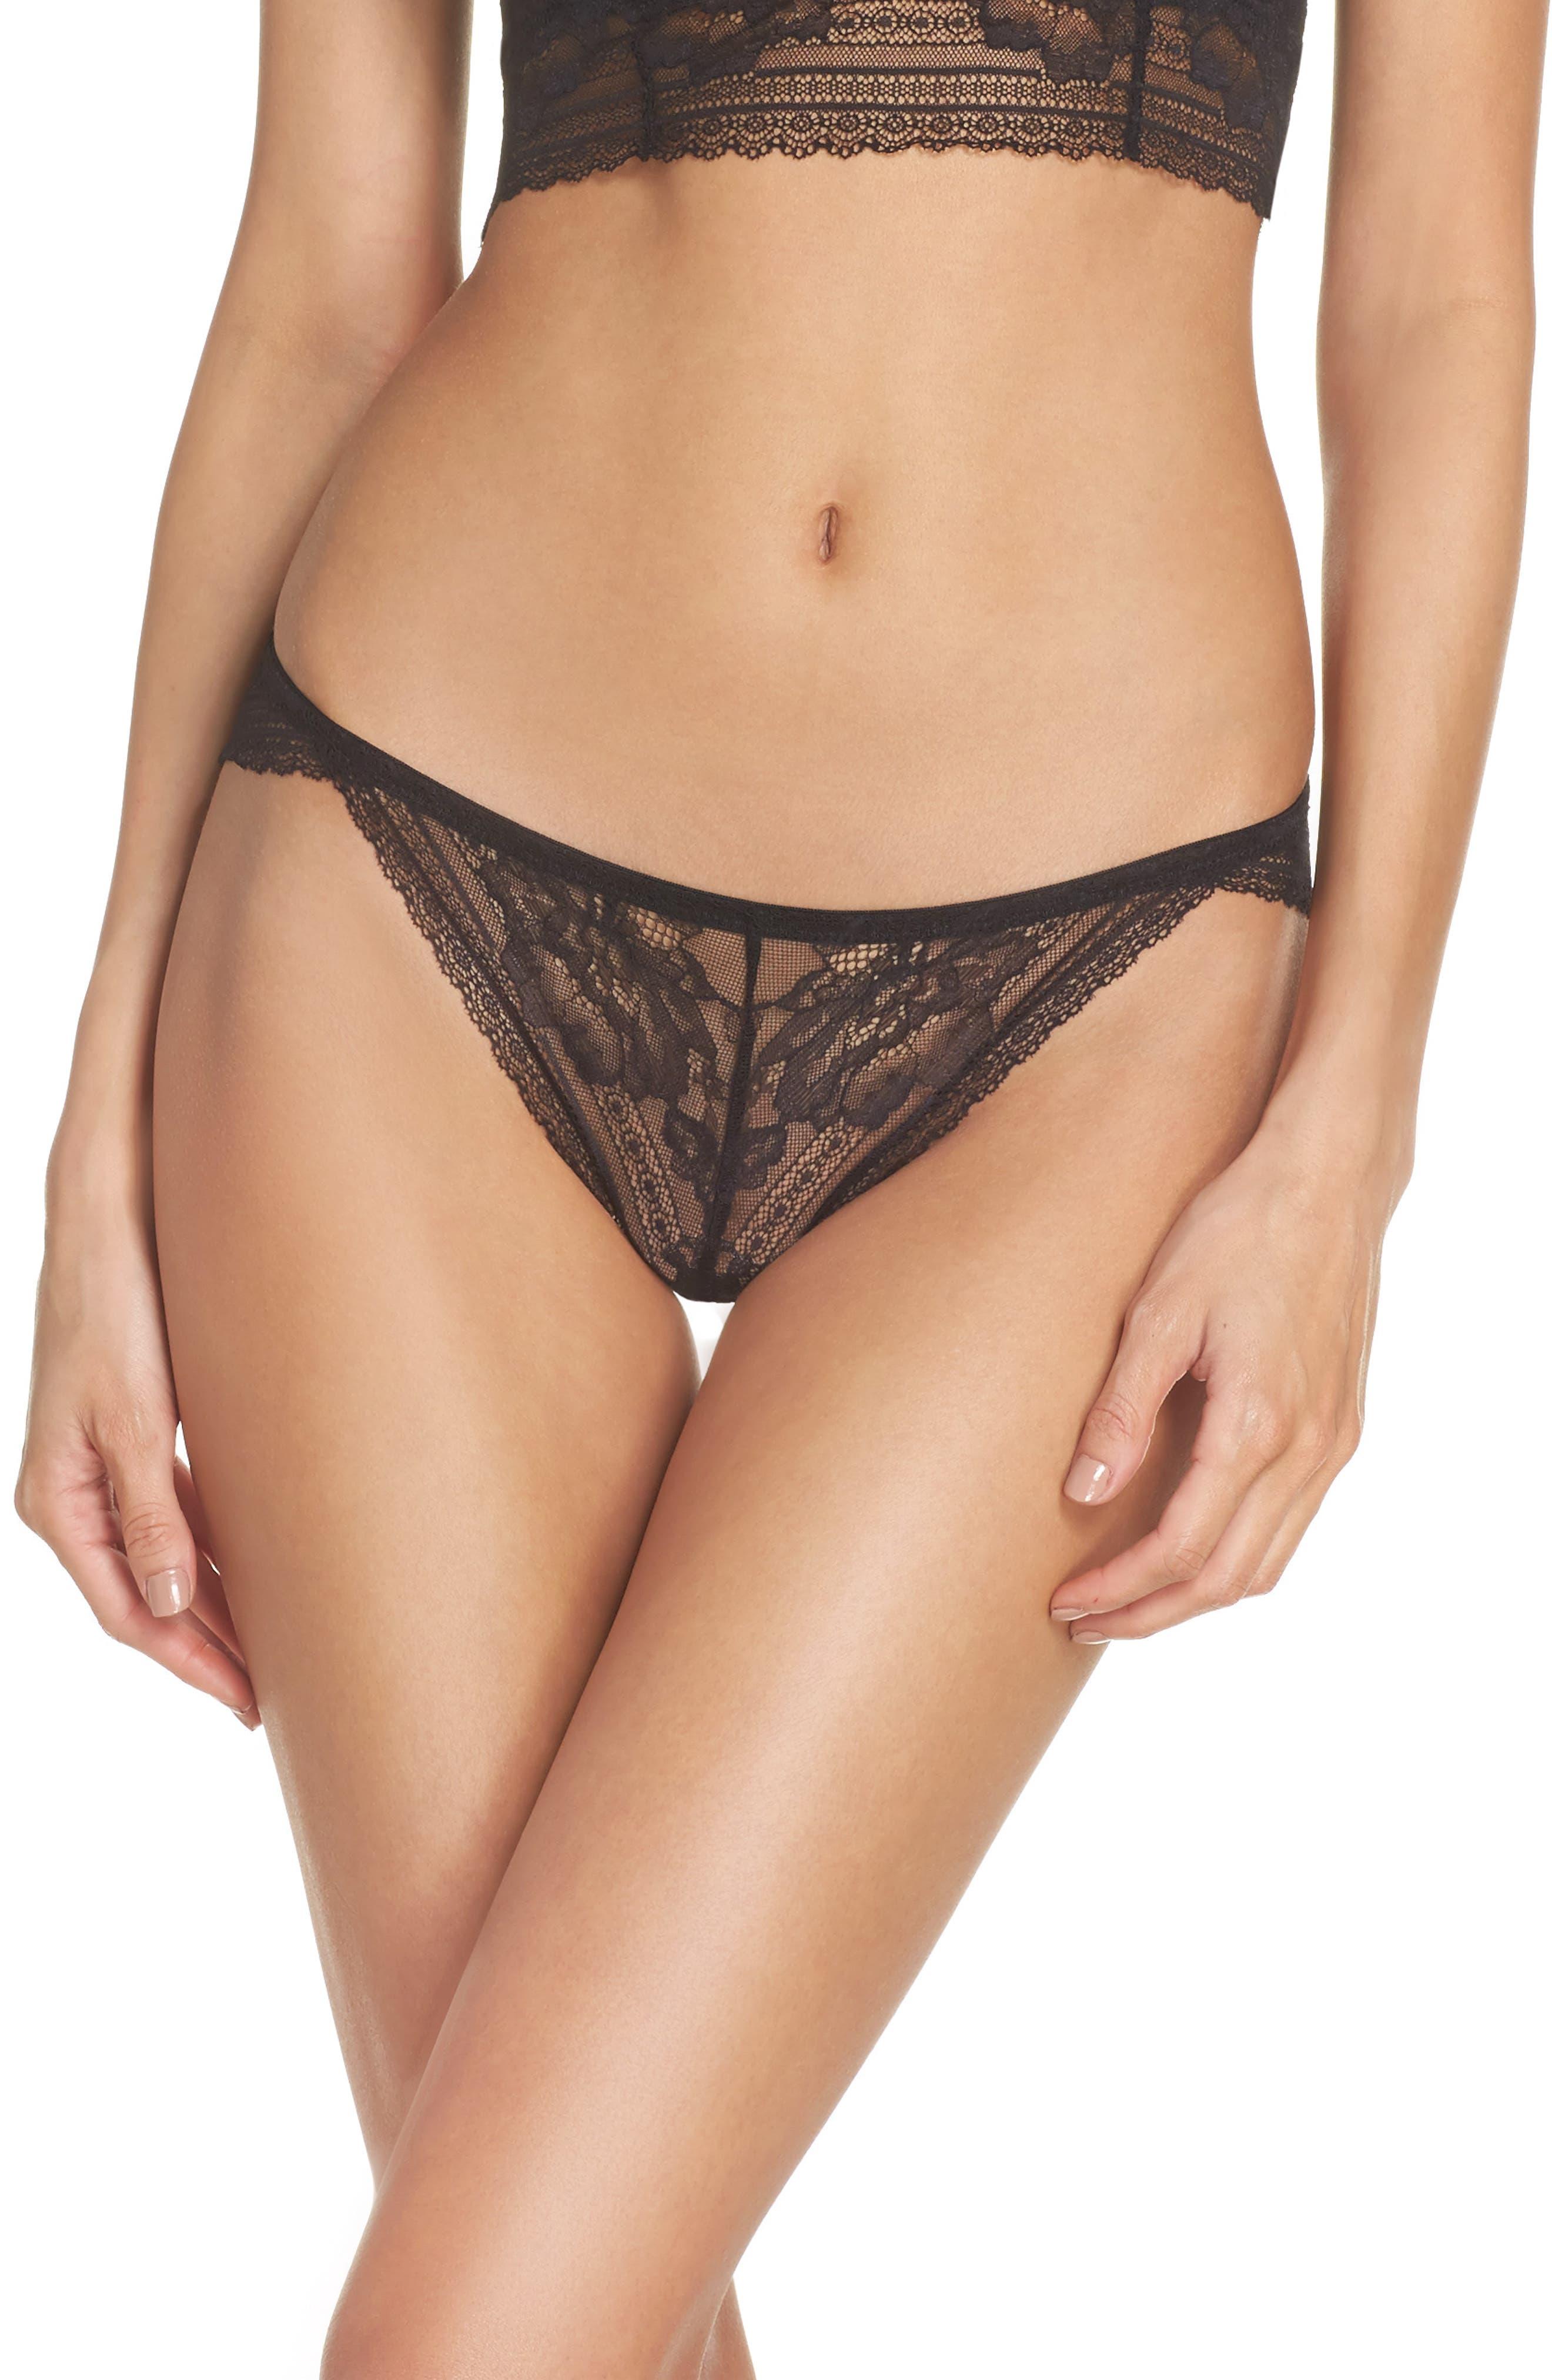 Intimately FP Sorento Lace Bikini,                         Main,                         color, Black